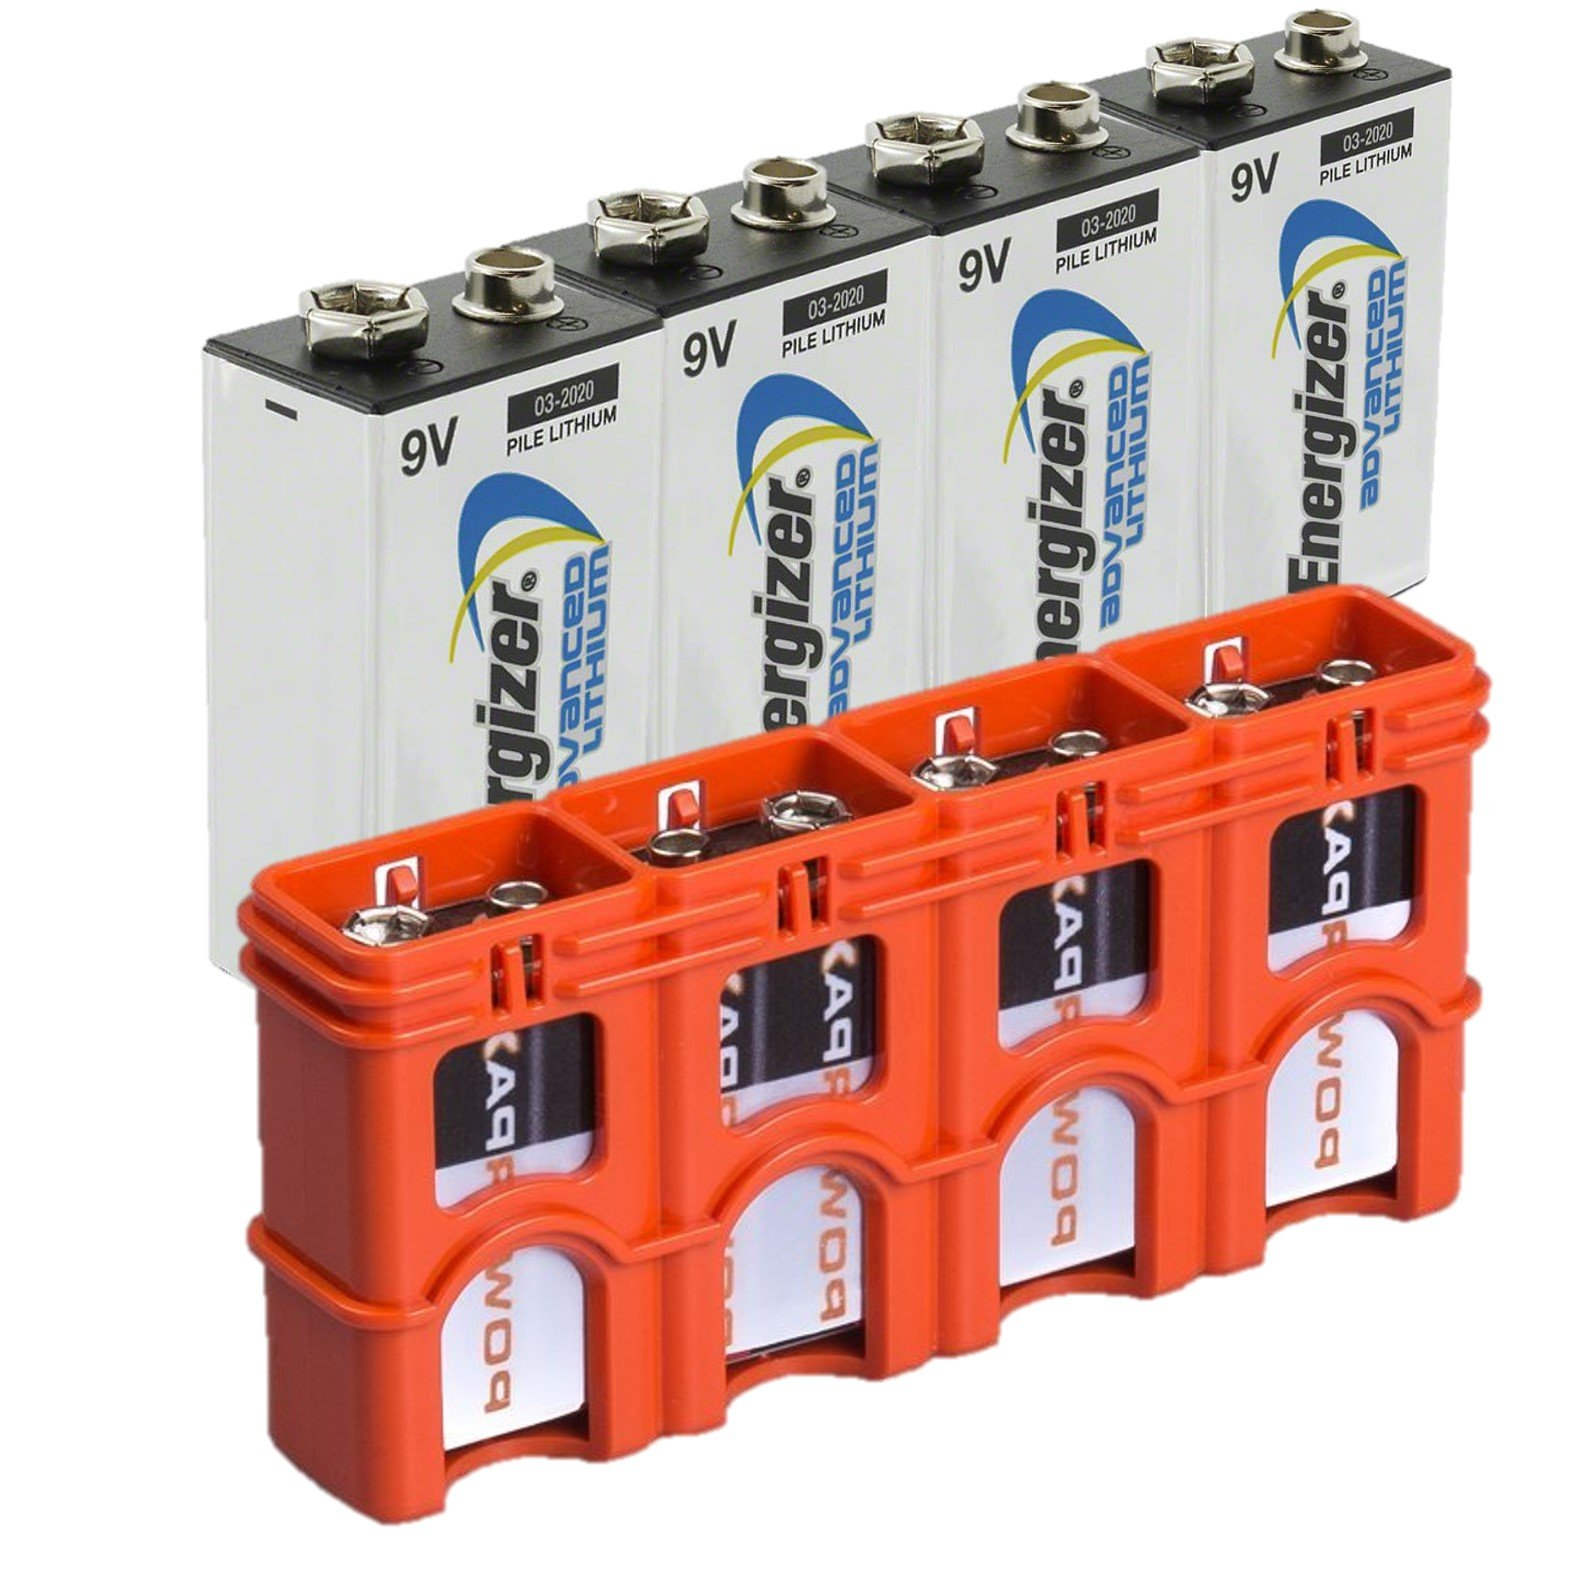 4 Energizer 9V Advanced Lithium Batteries LA522 with Powerpax 9 Volt Battery Cady